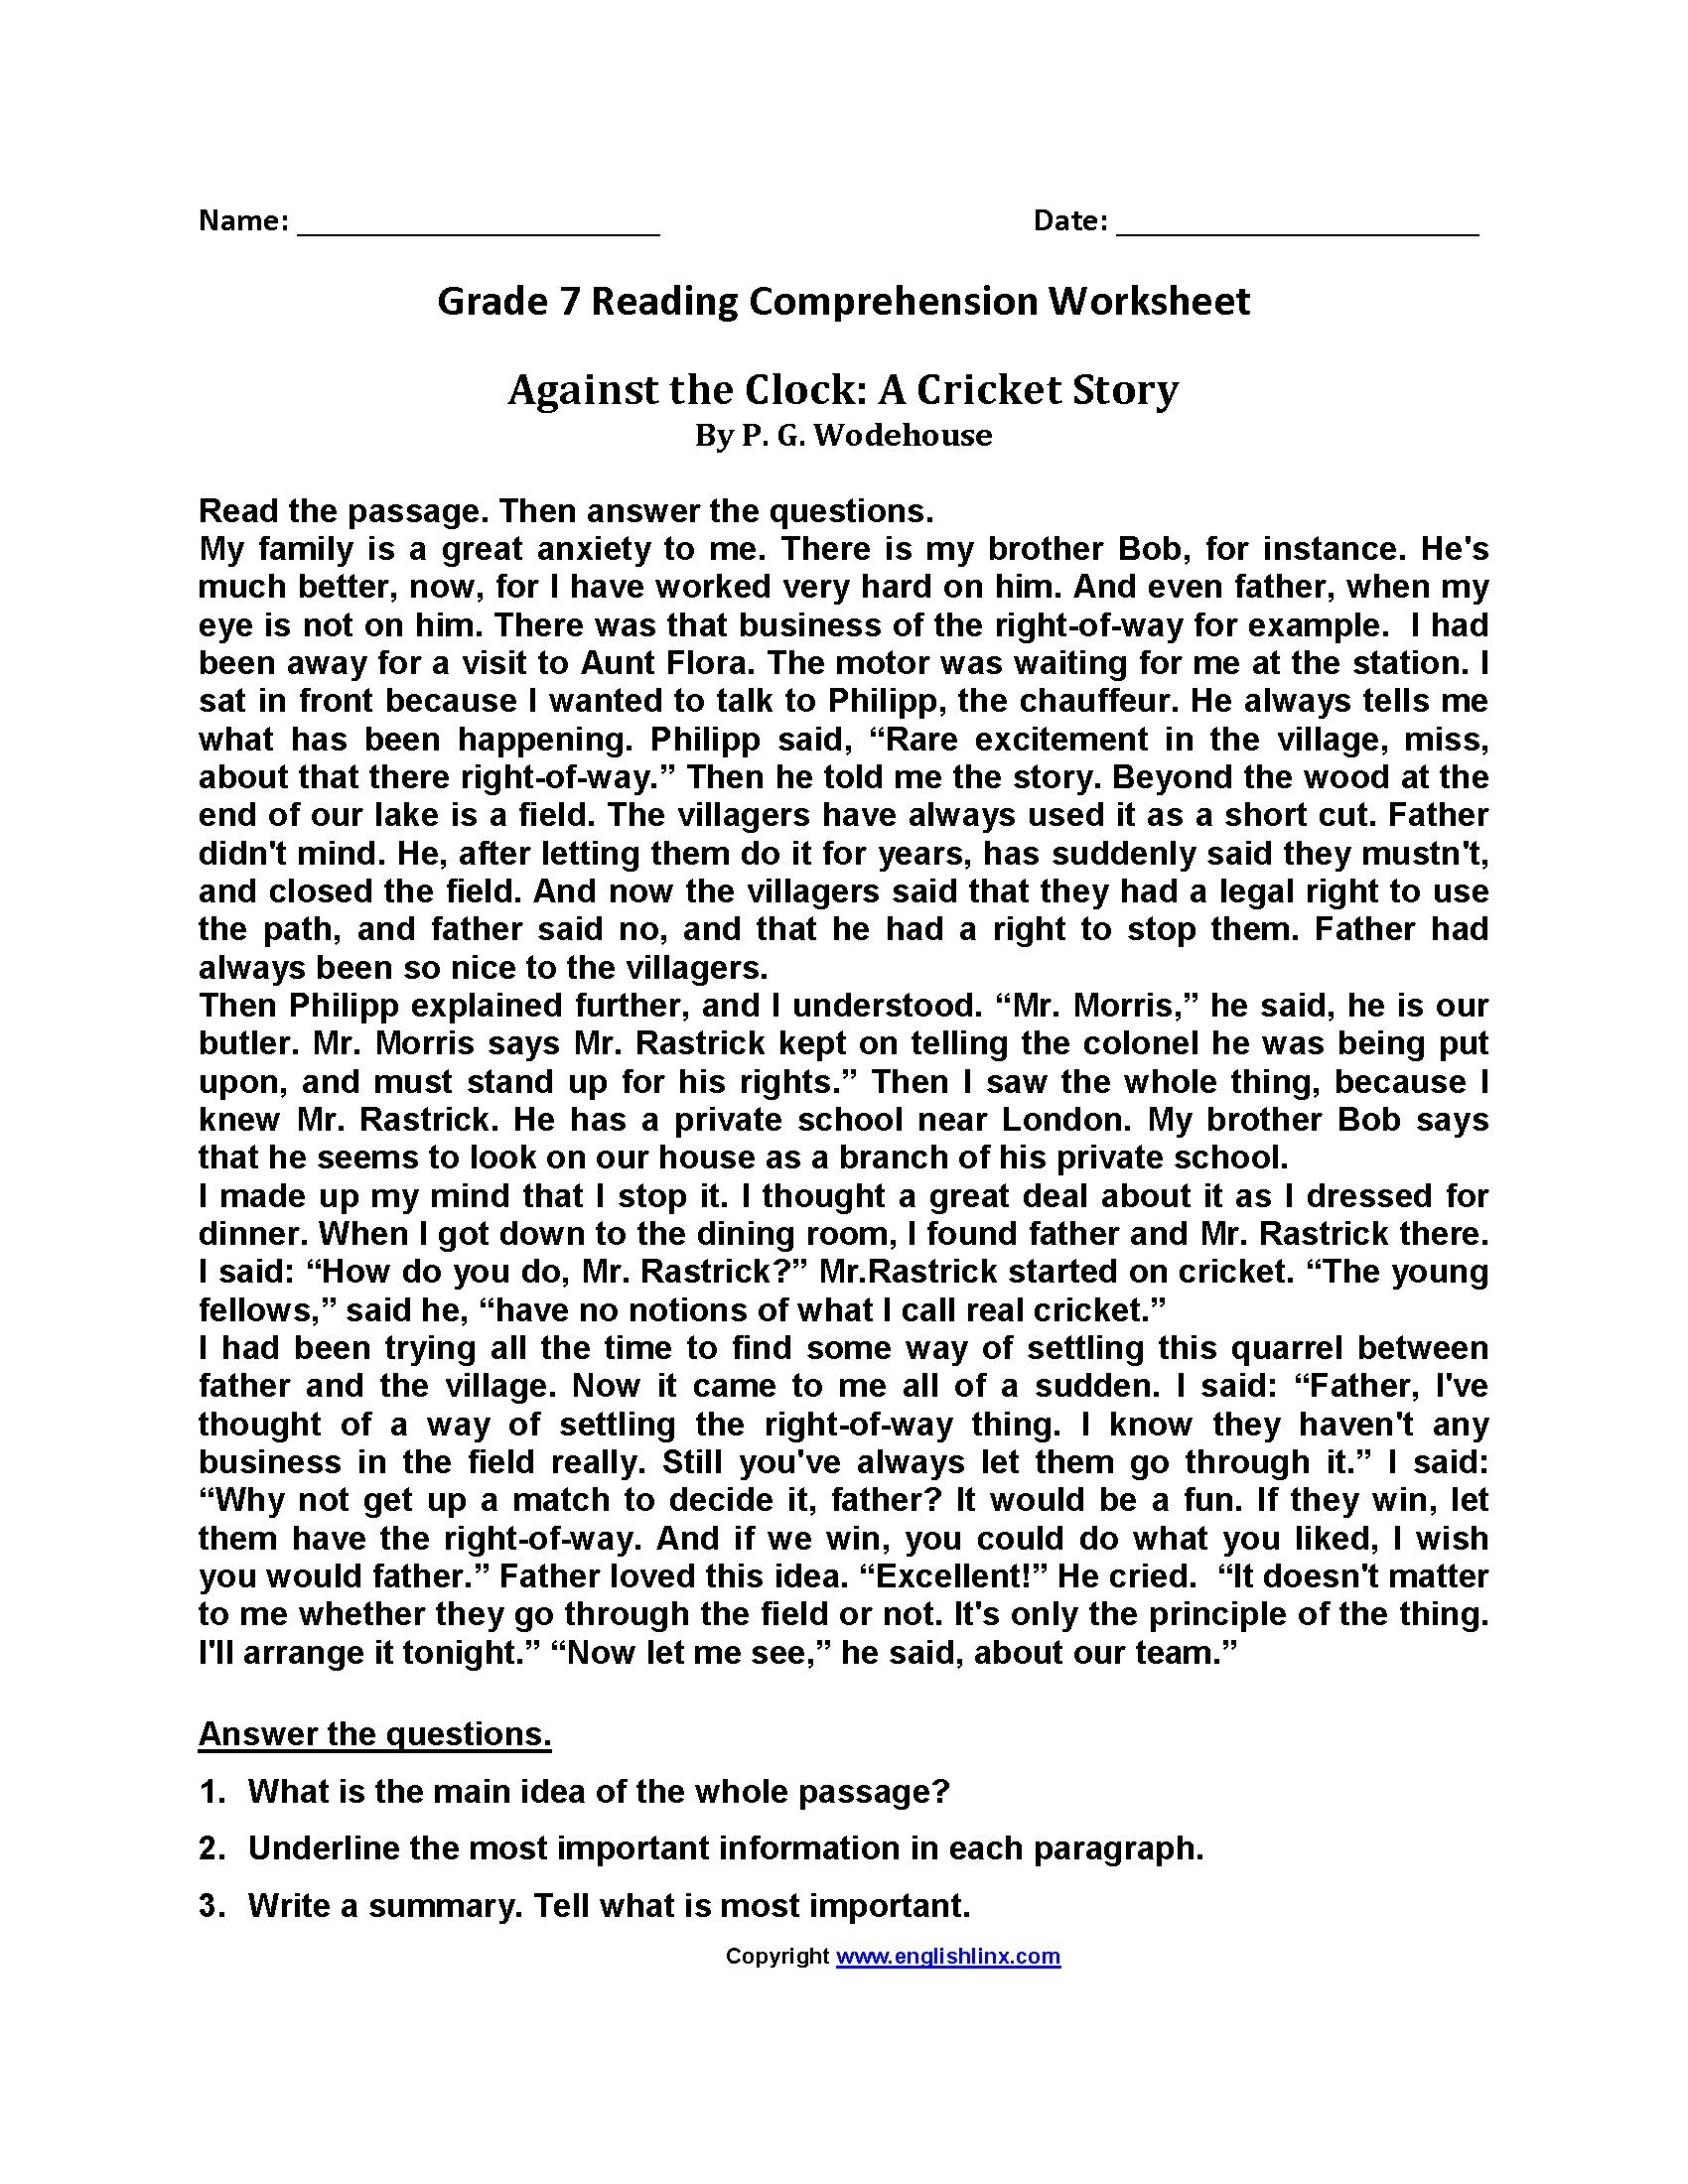 15 Academic Worksheets For 7th Grade Di